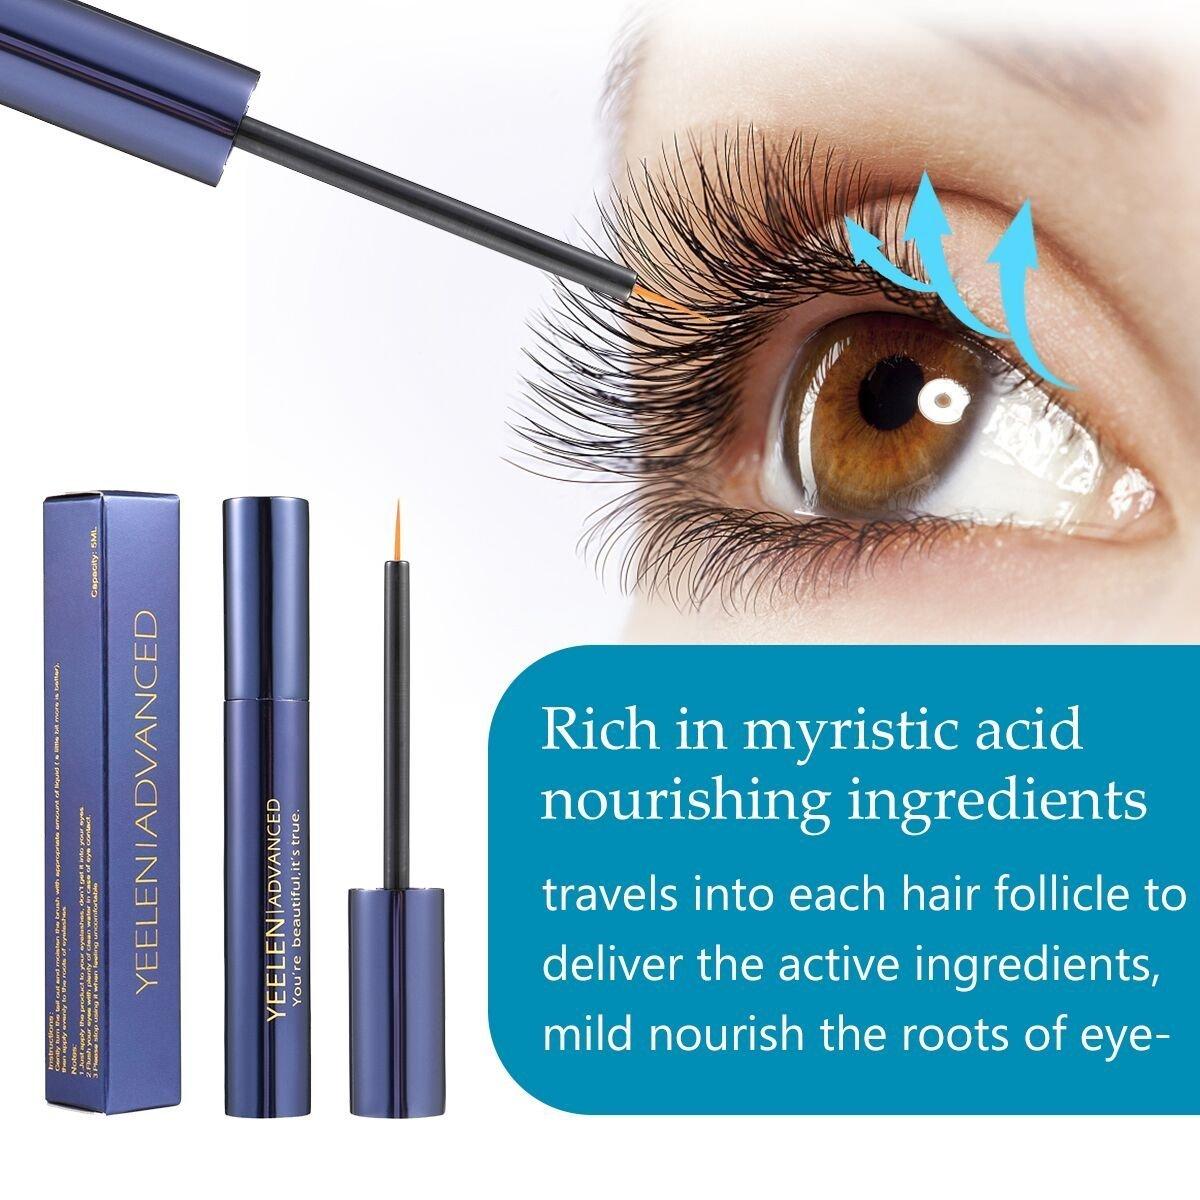 Yeelen Eyelash Eyebrow Growth Serum Grows Longer, Fuller, Thicker Lashes & Brows in 45 days! Enhancer Eyelash Conditioner Non-prescription Eyelash Serum 5ml by Yeelen (Image #2)